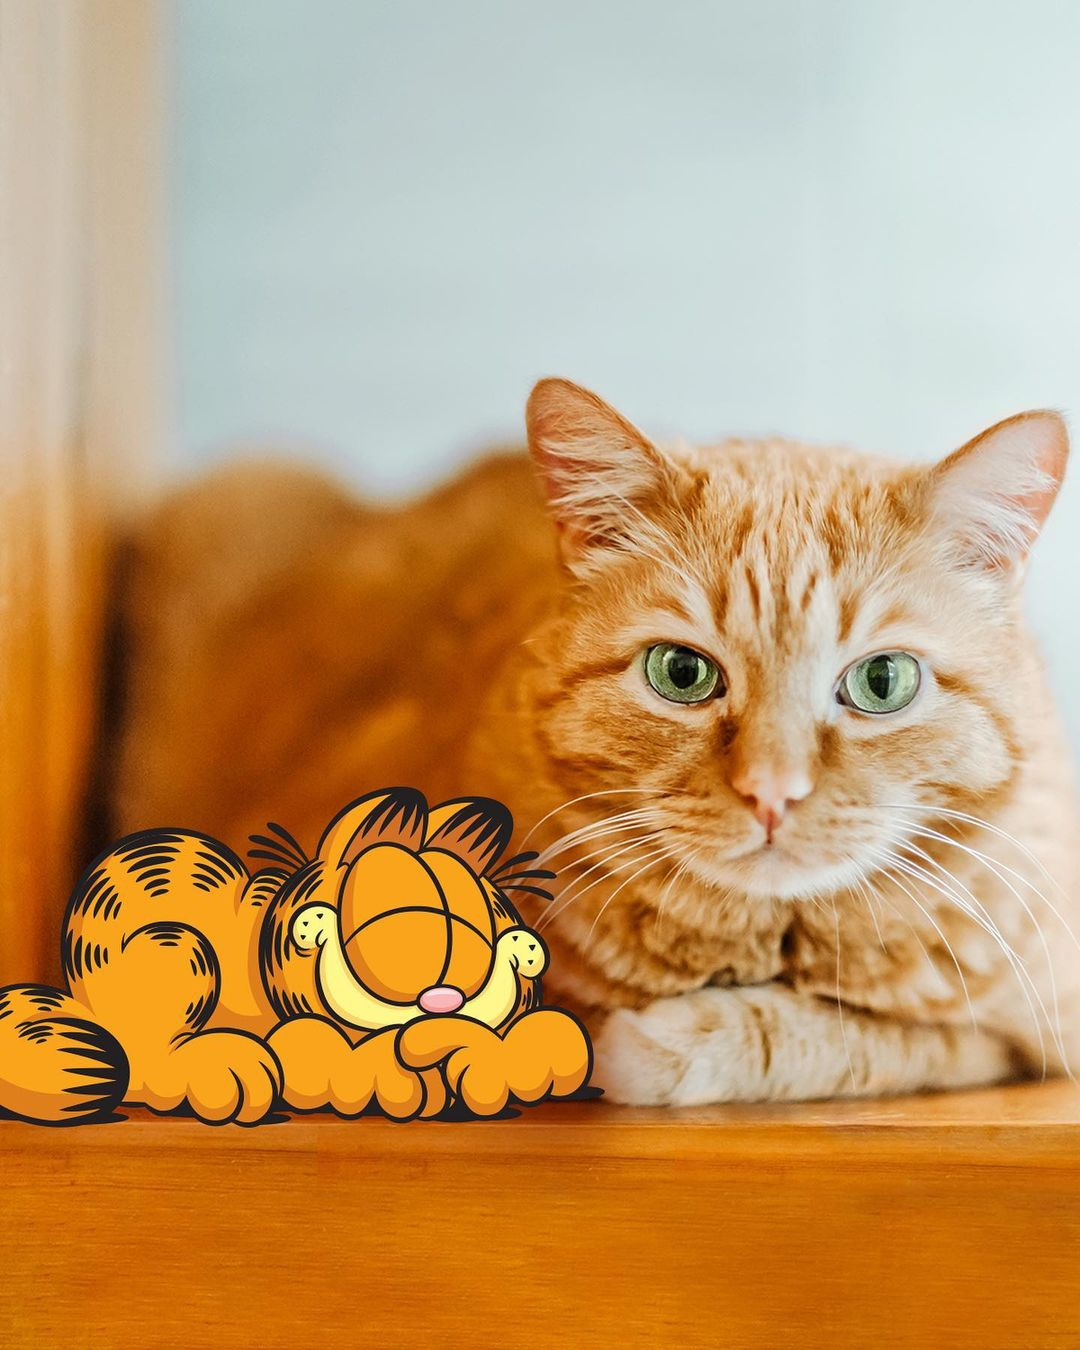 Courtesy of Garfield